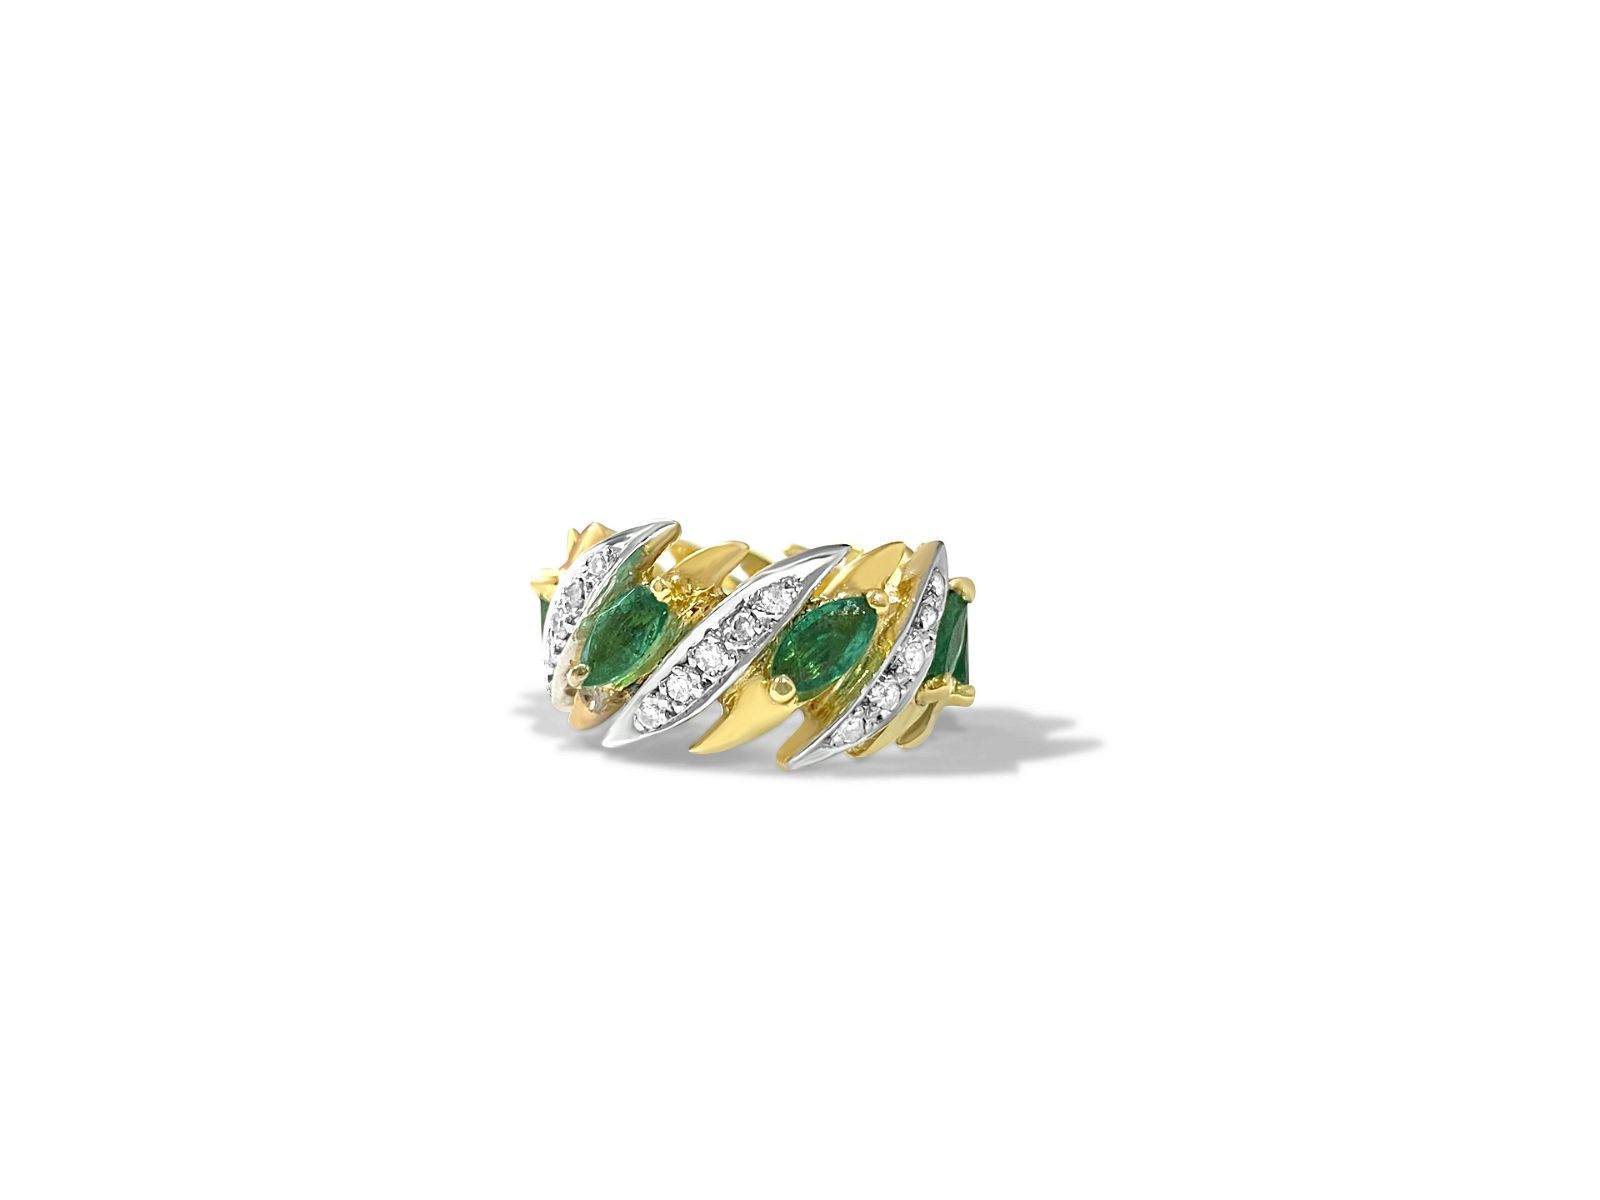 Modern 3.05 Carat Diamond & Emerald Ring 14K Gold